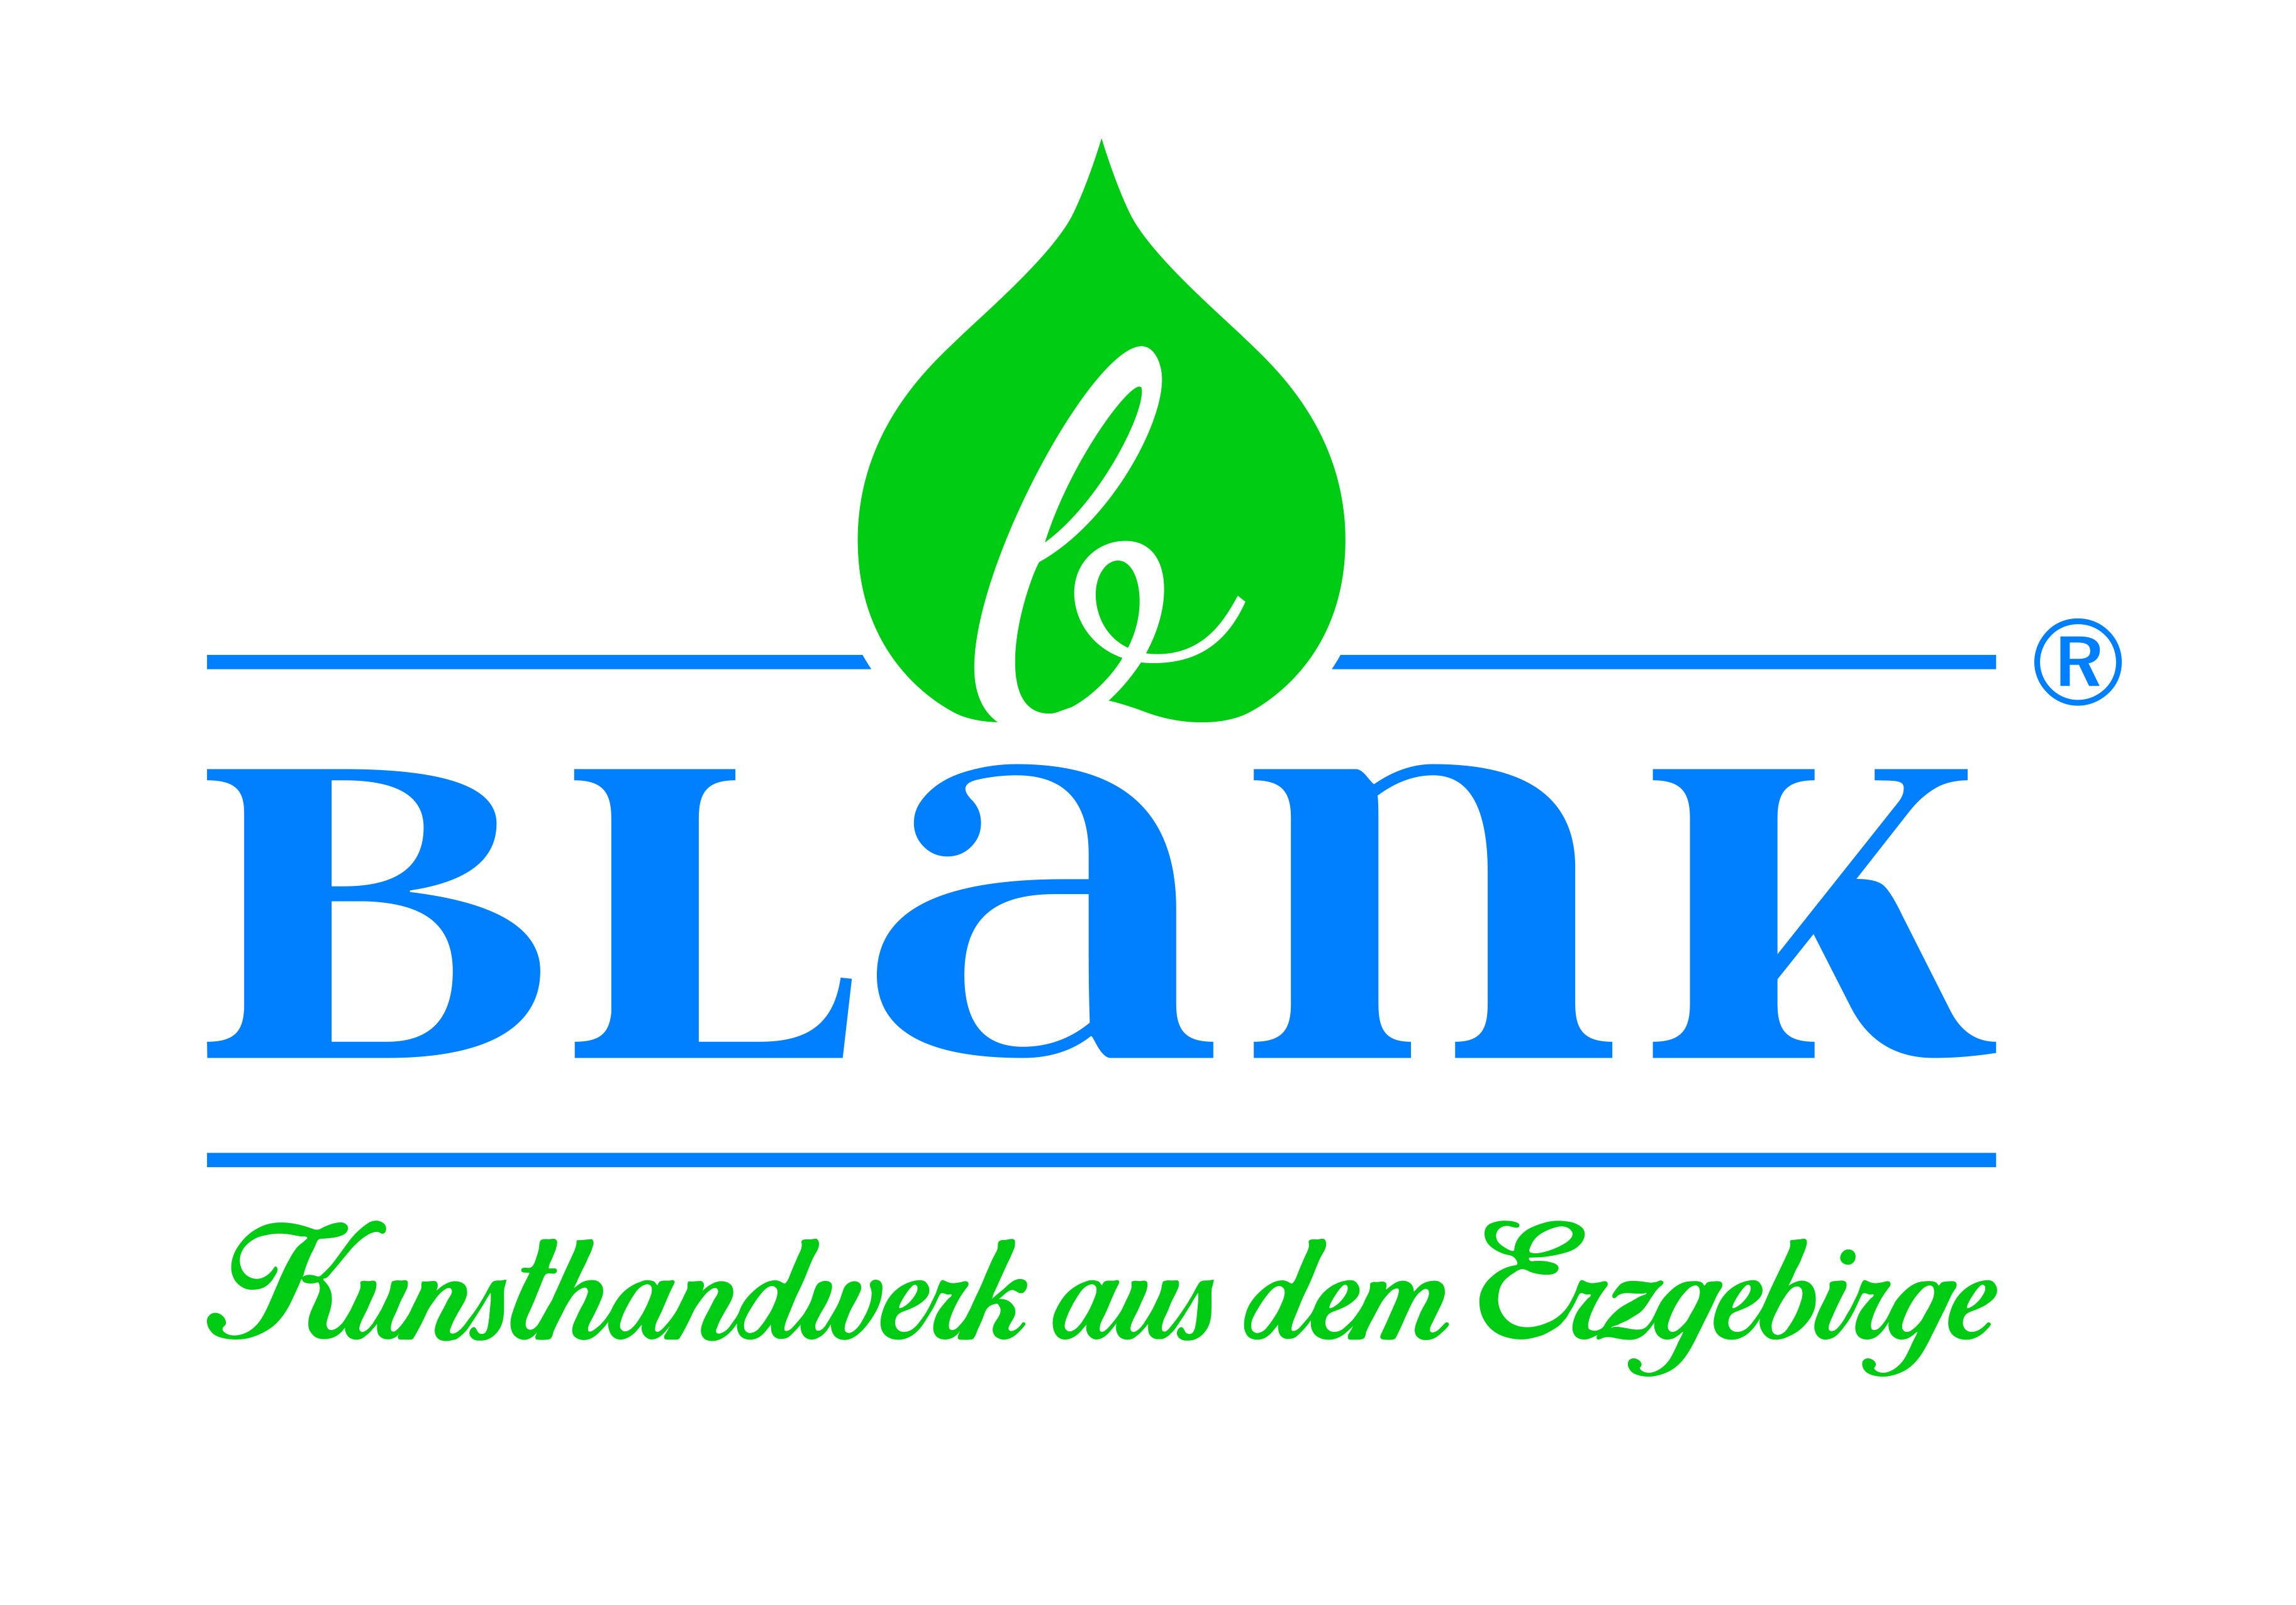 Blank Kunsthandwerk